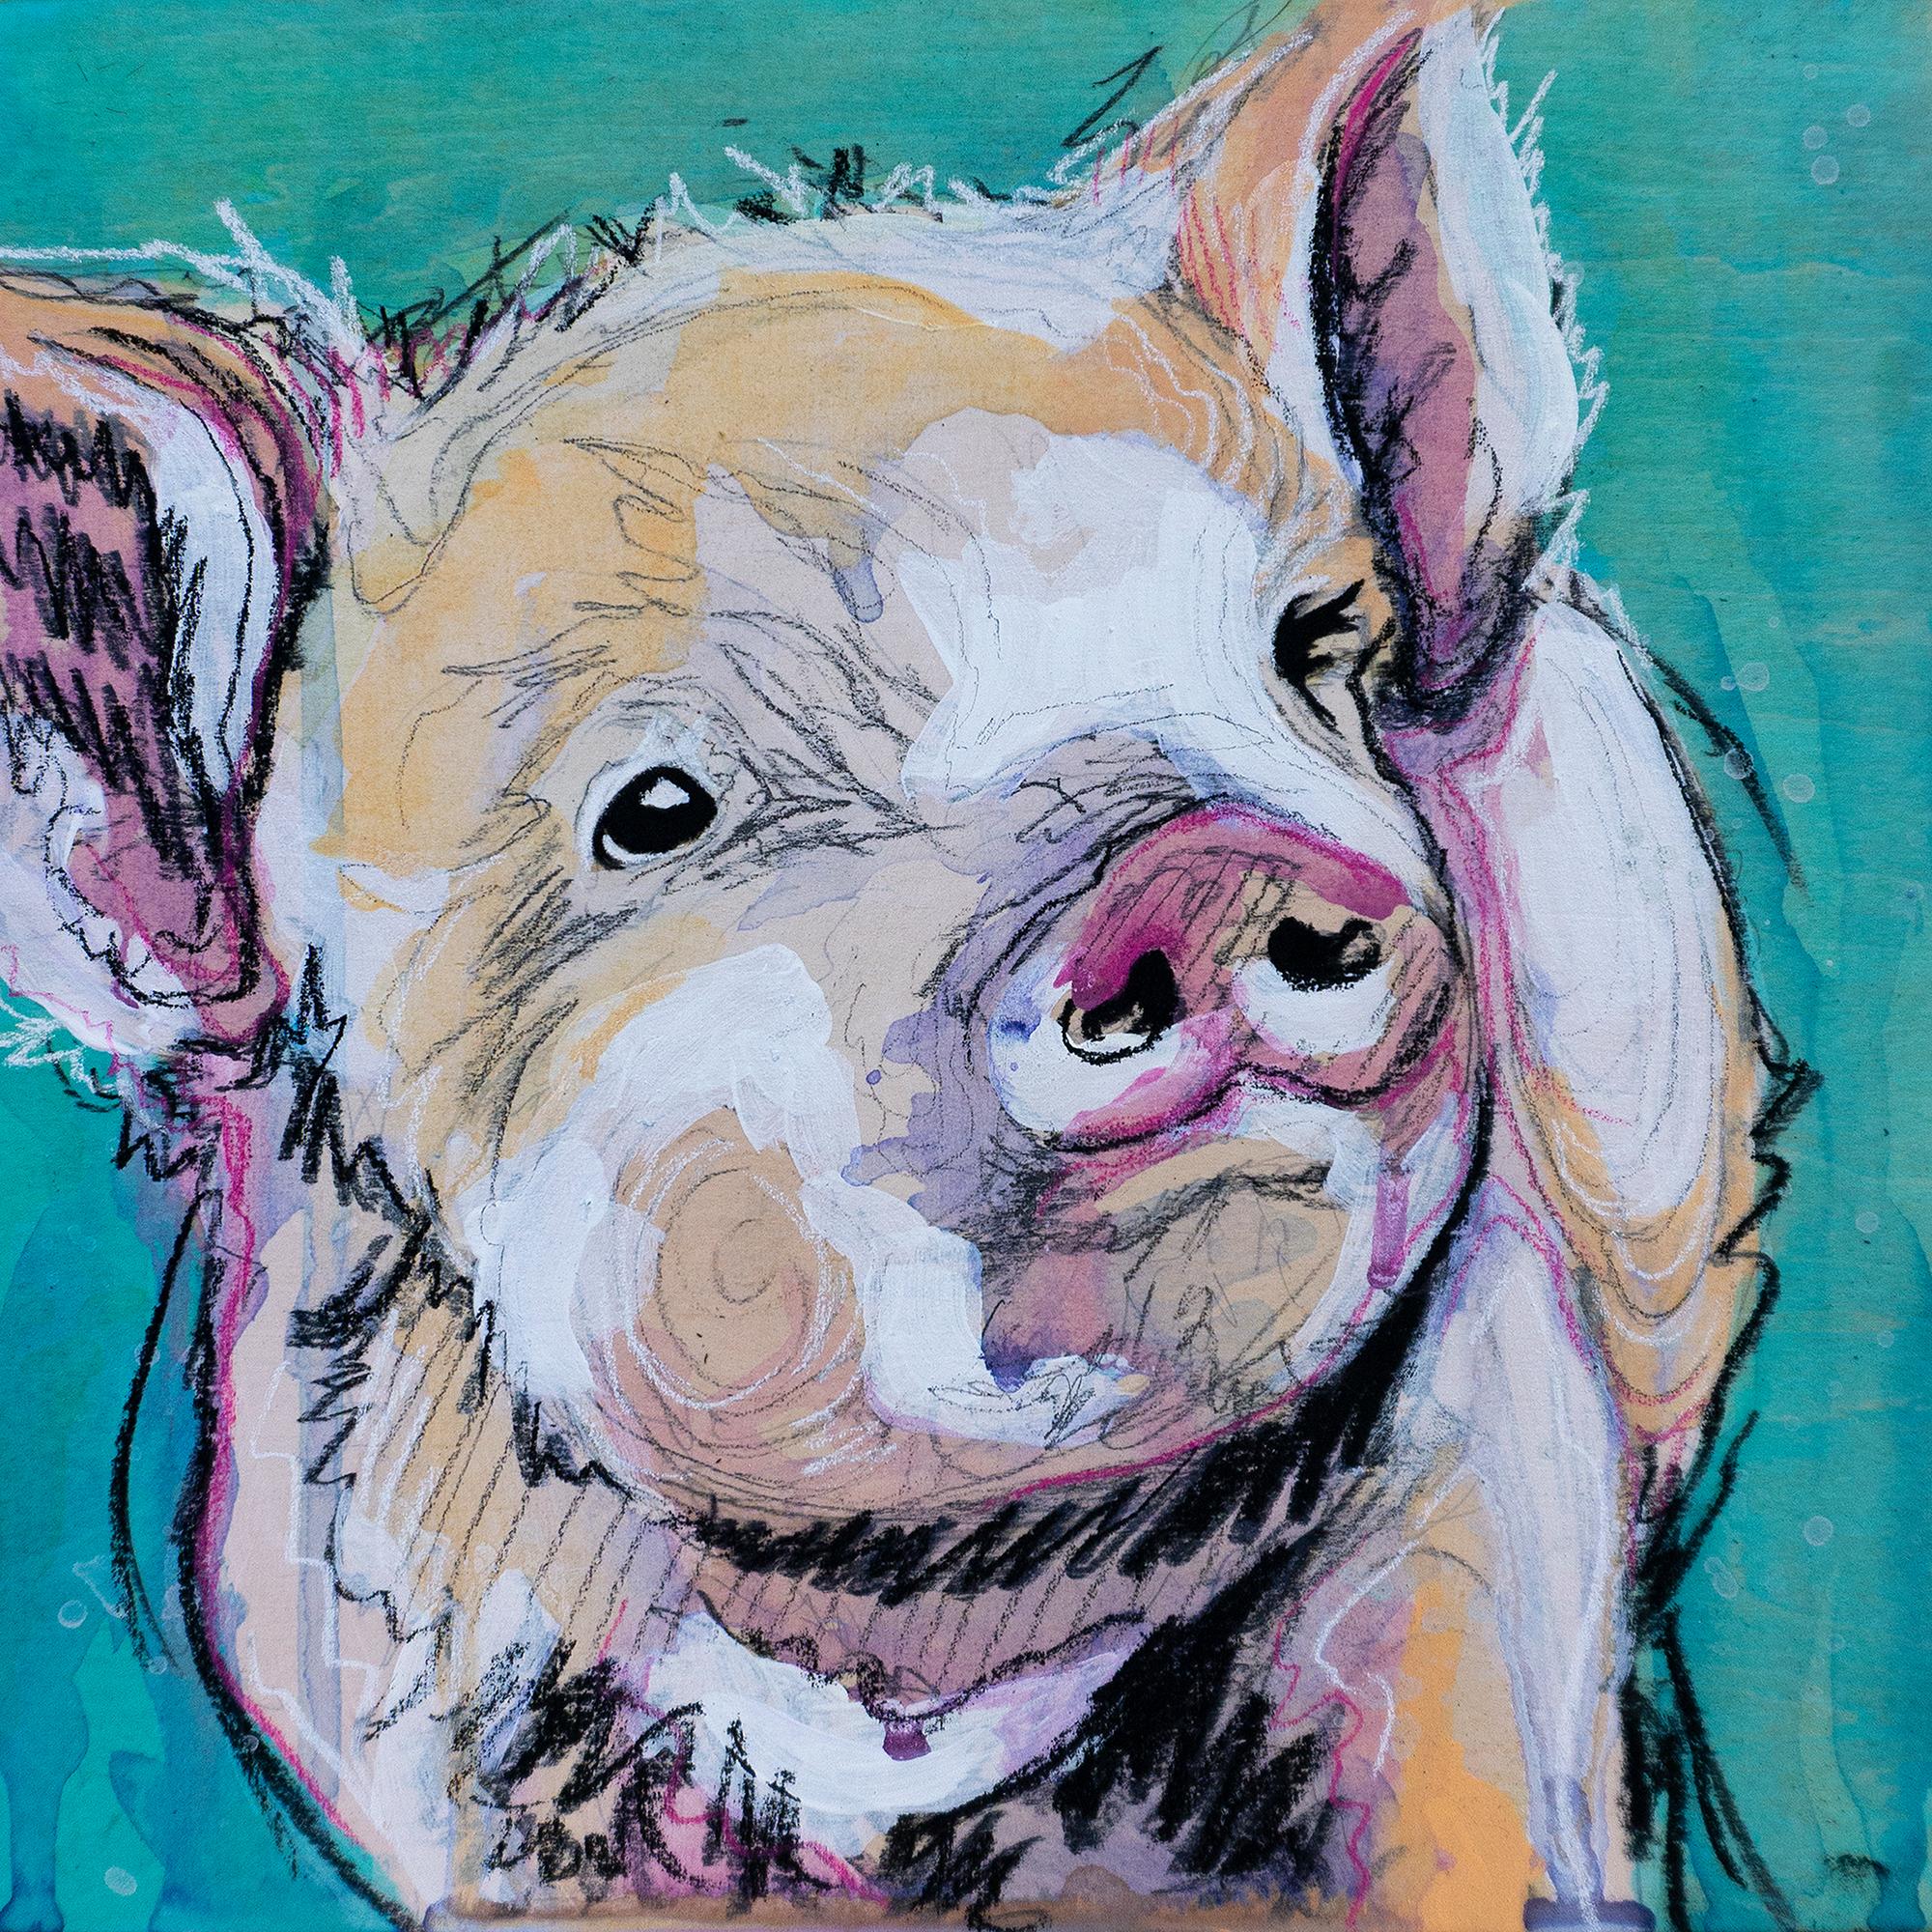 This little piggy painting final original v46dyq